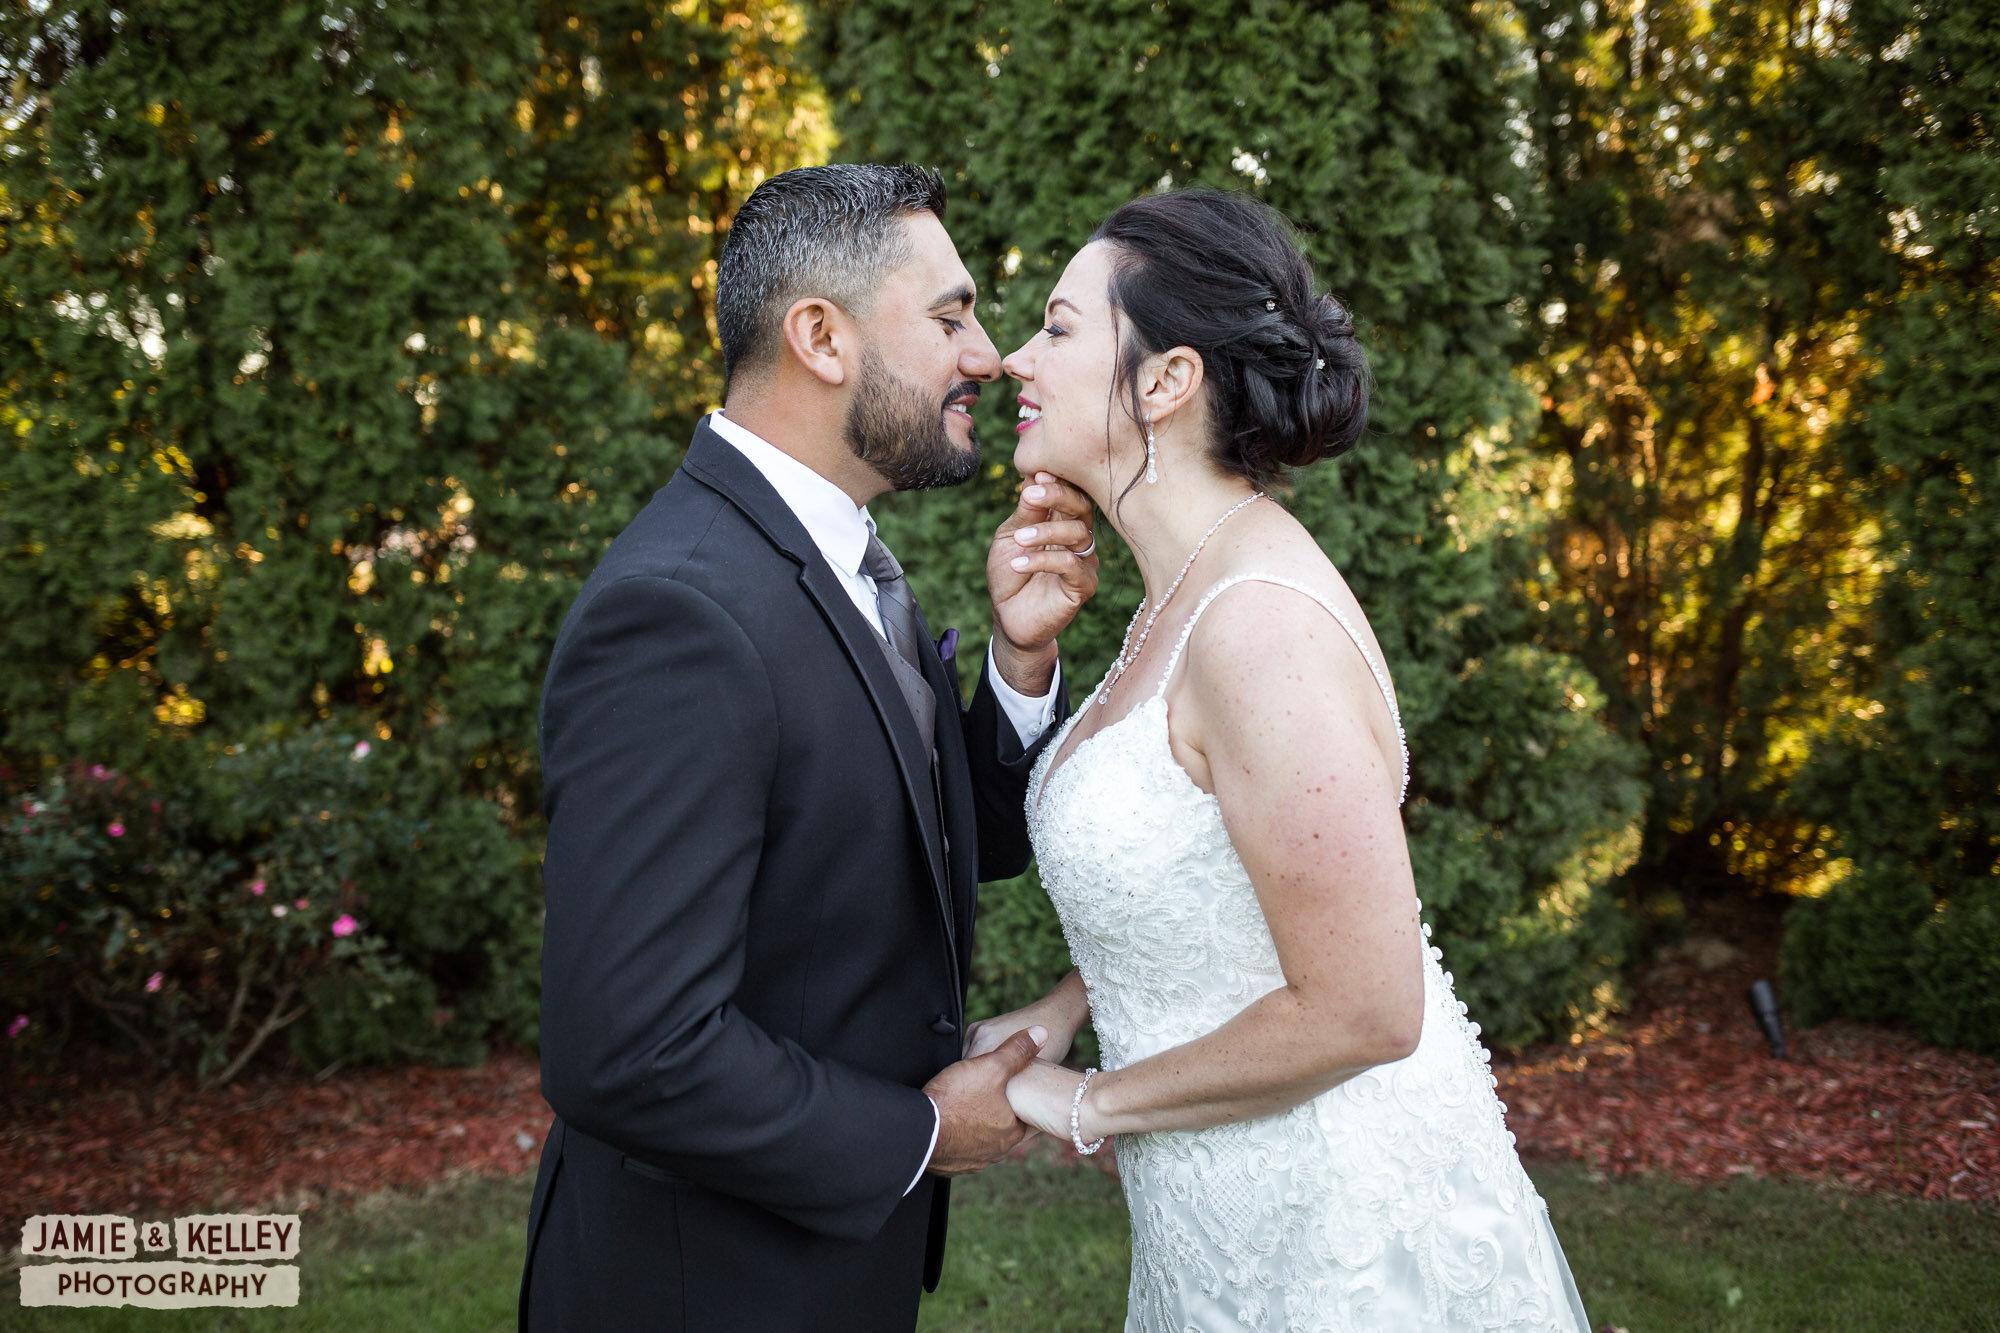 JK_ArinAndIsrael_WeddingTeasers_SprucedUp-01.jpg